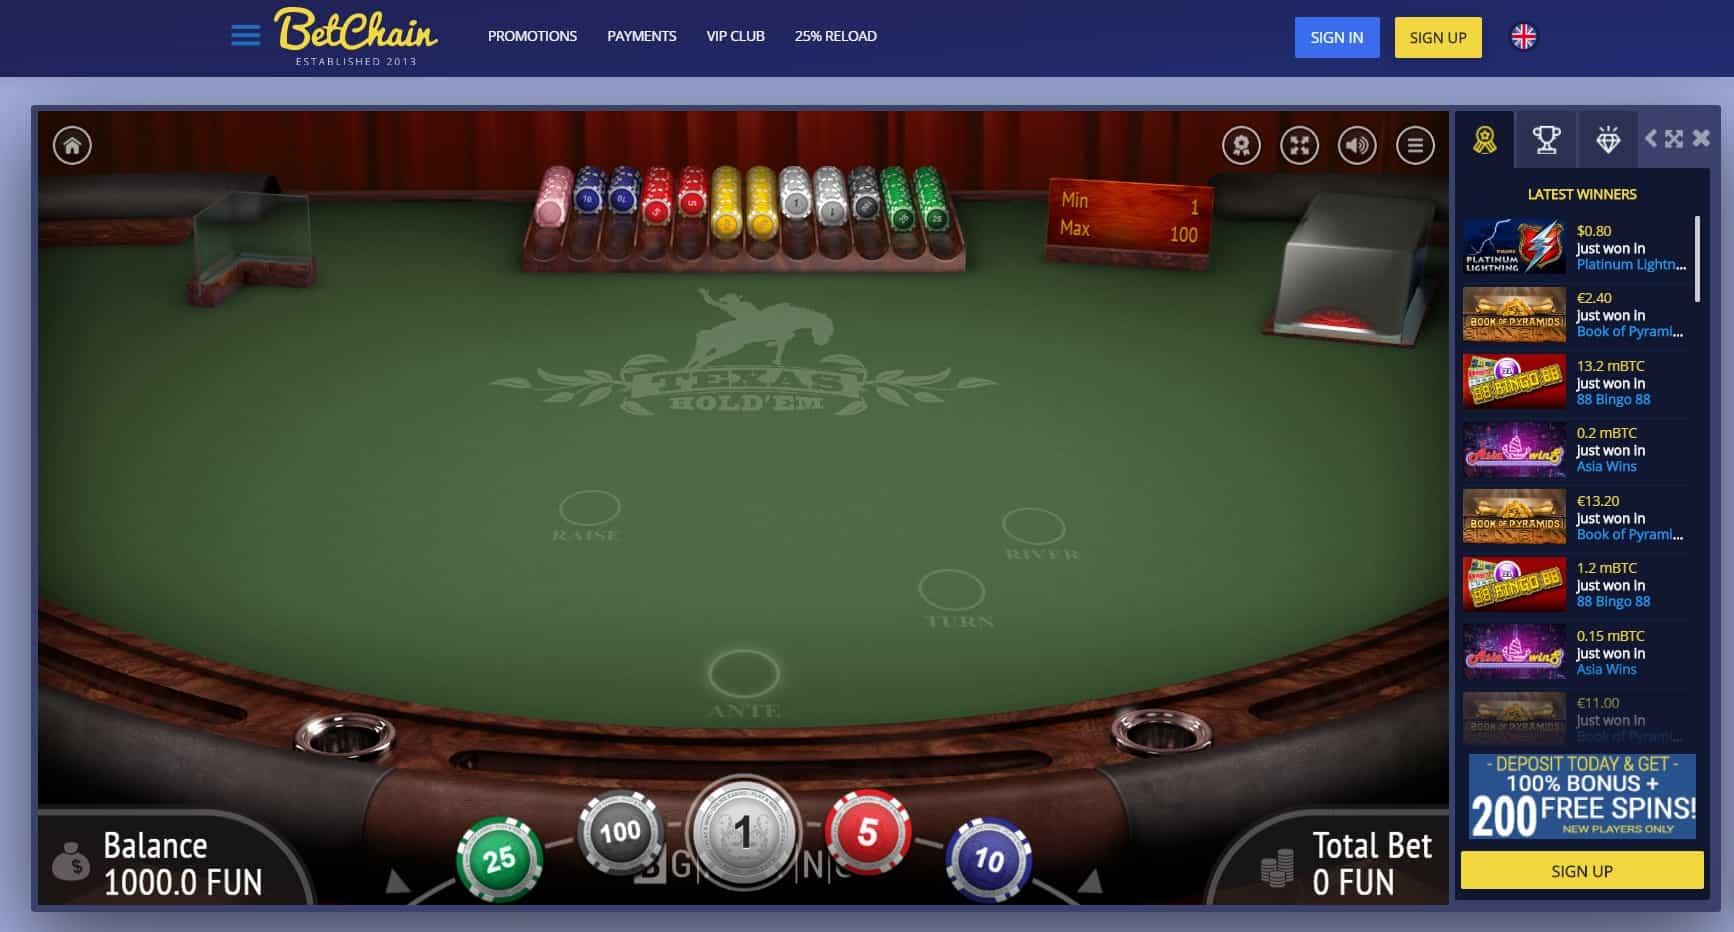 Bet chain casino texas holdem game